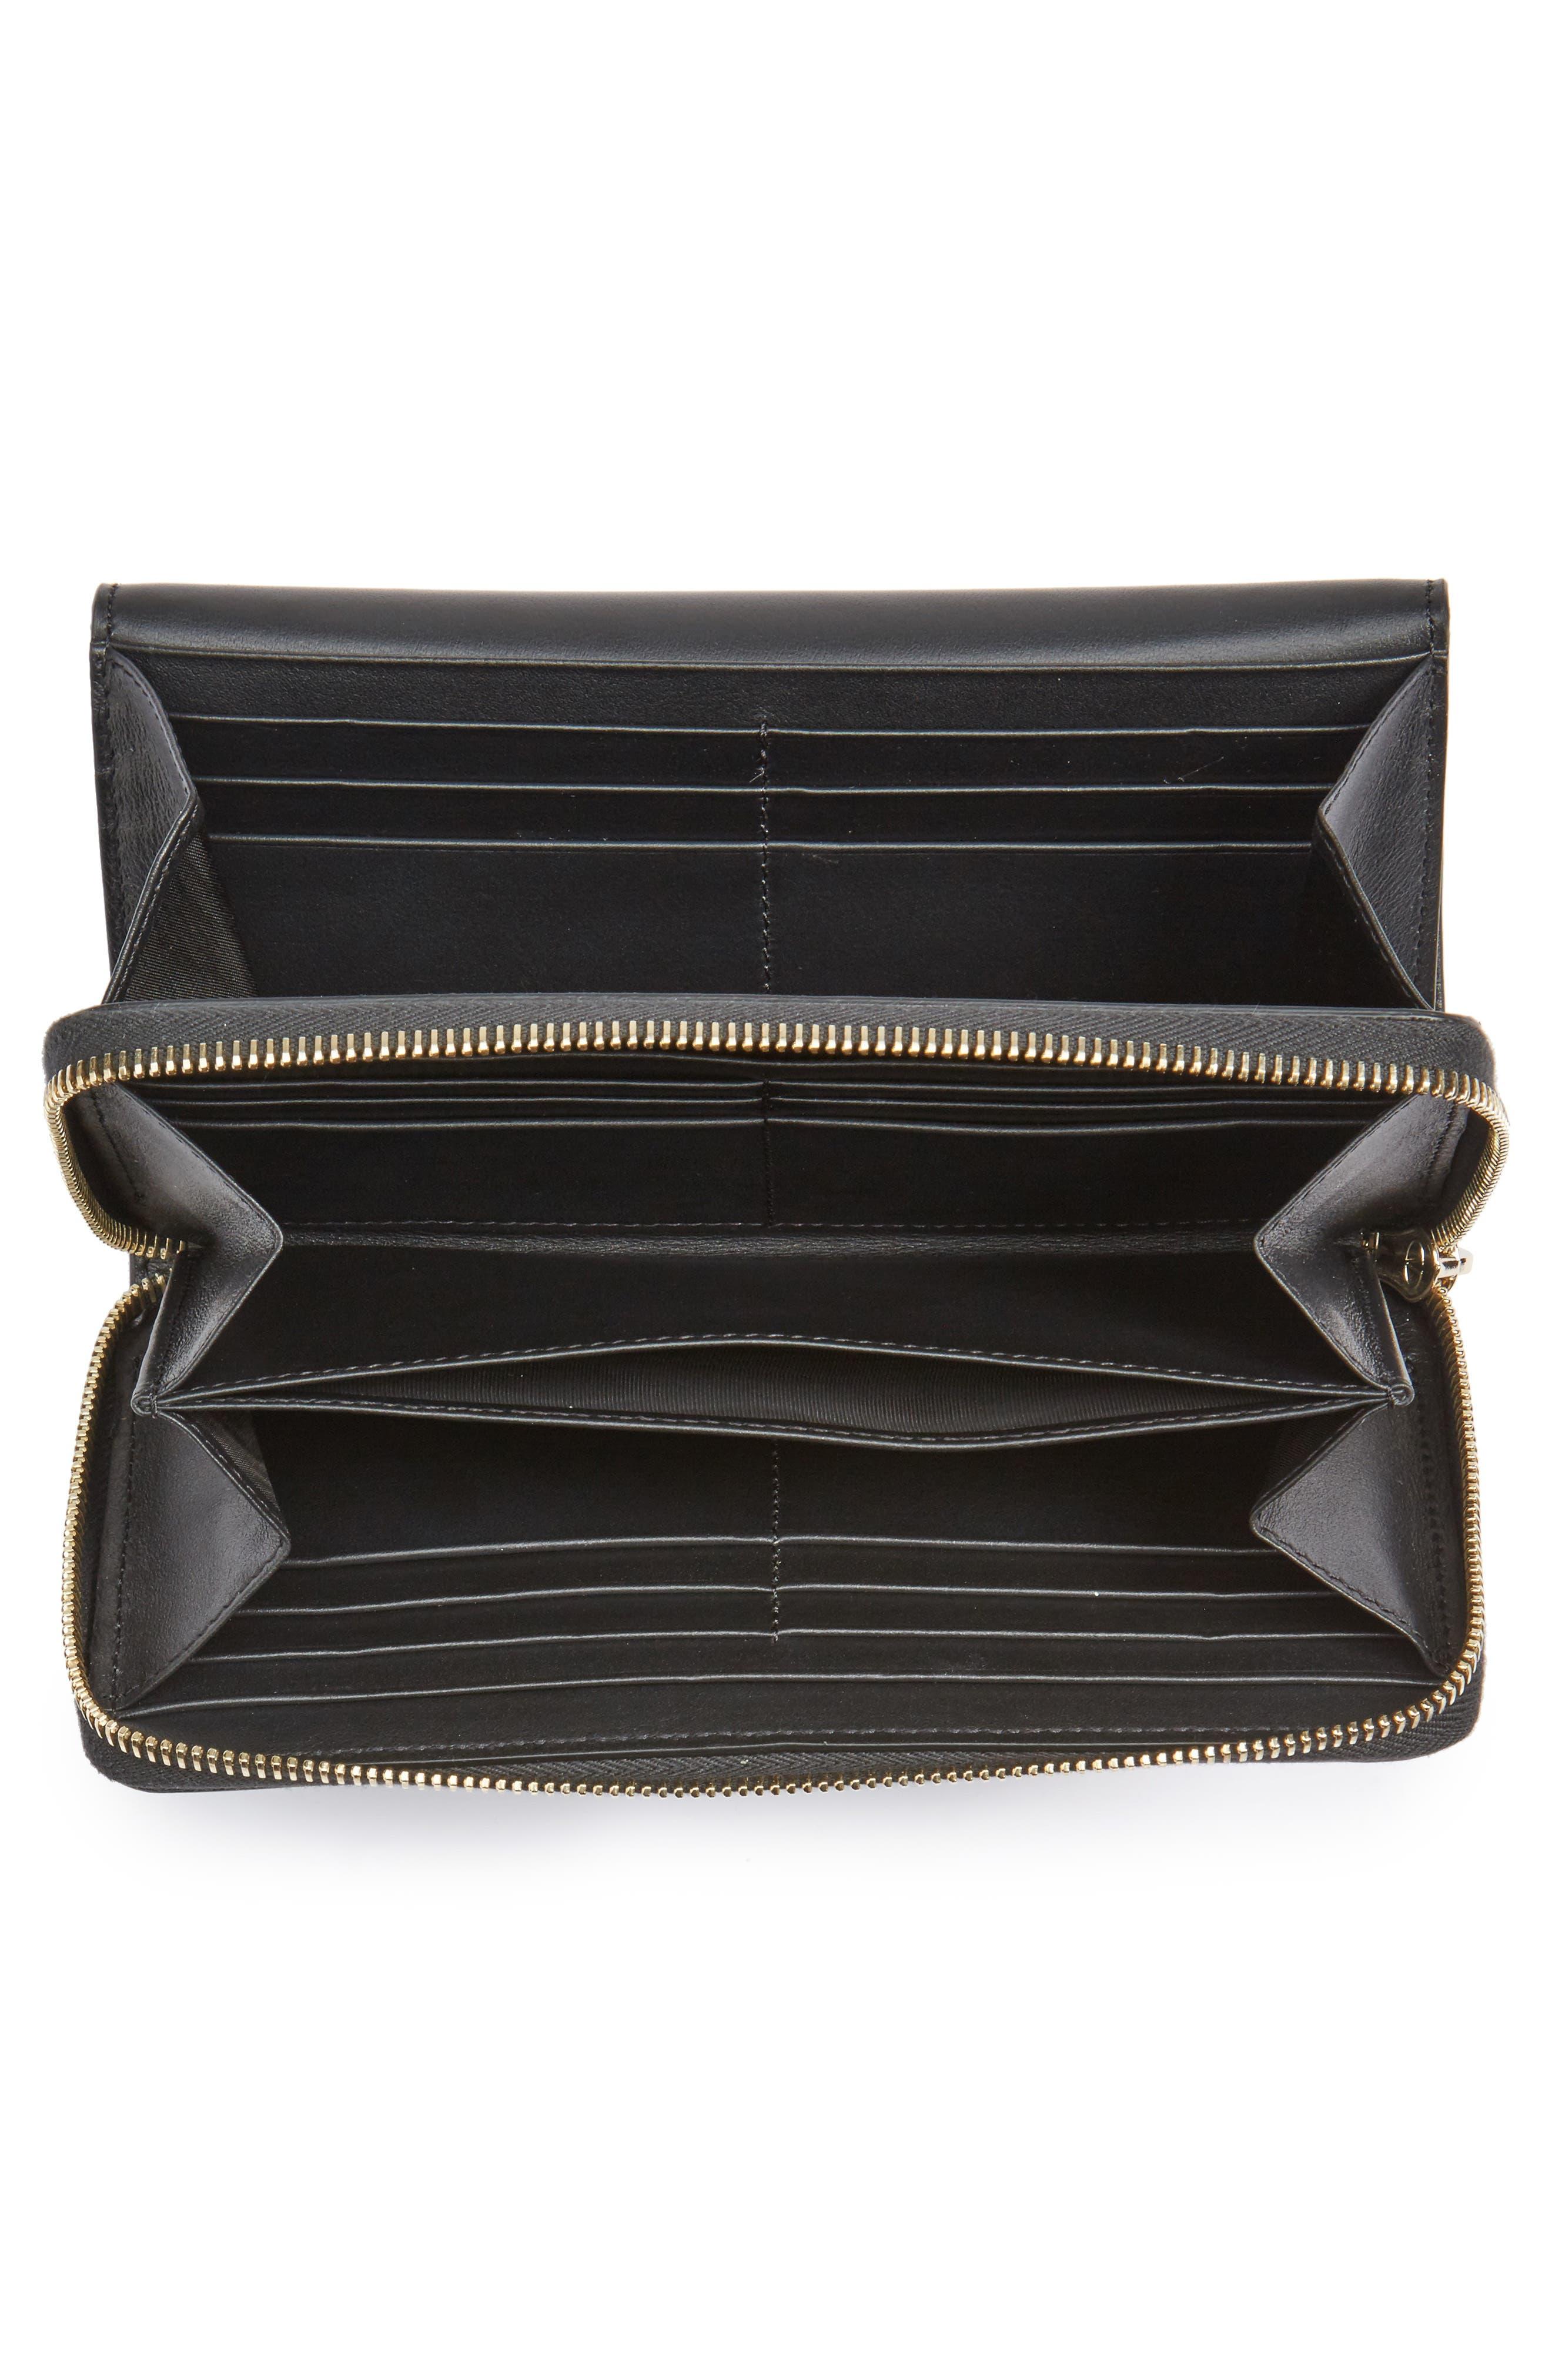 Alternate Image 3  - VALENTINO GARAVANI Small Rockstud Calfskin Leather Wallet on a Chain